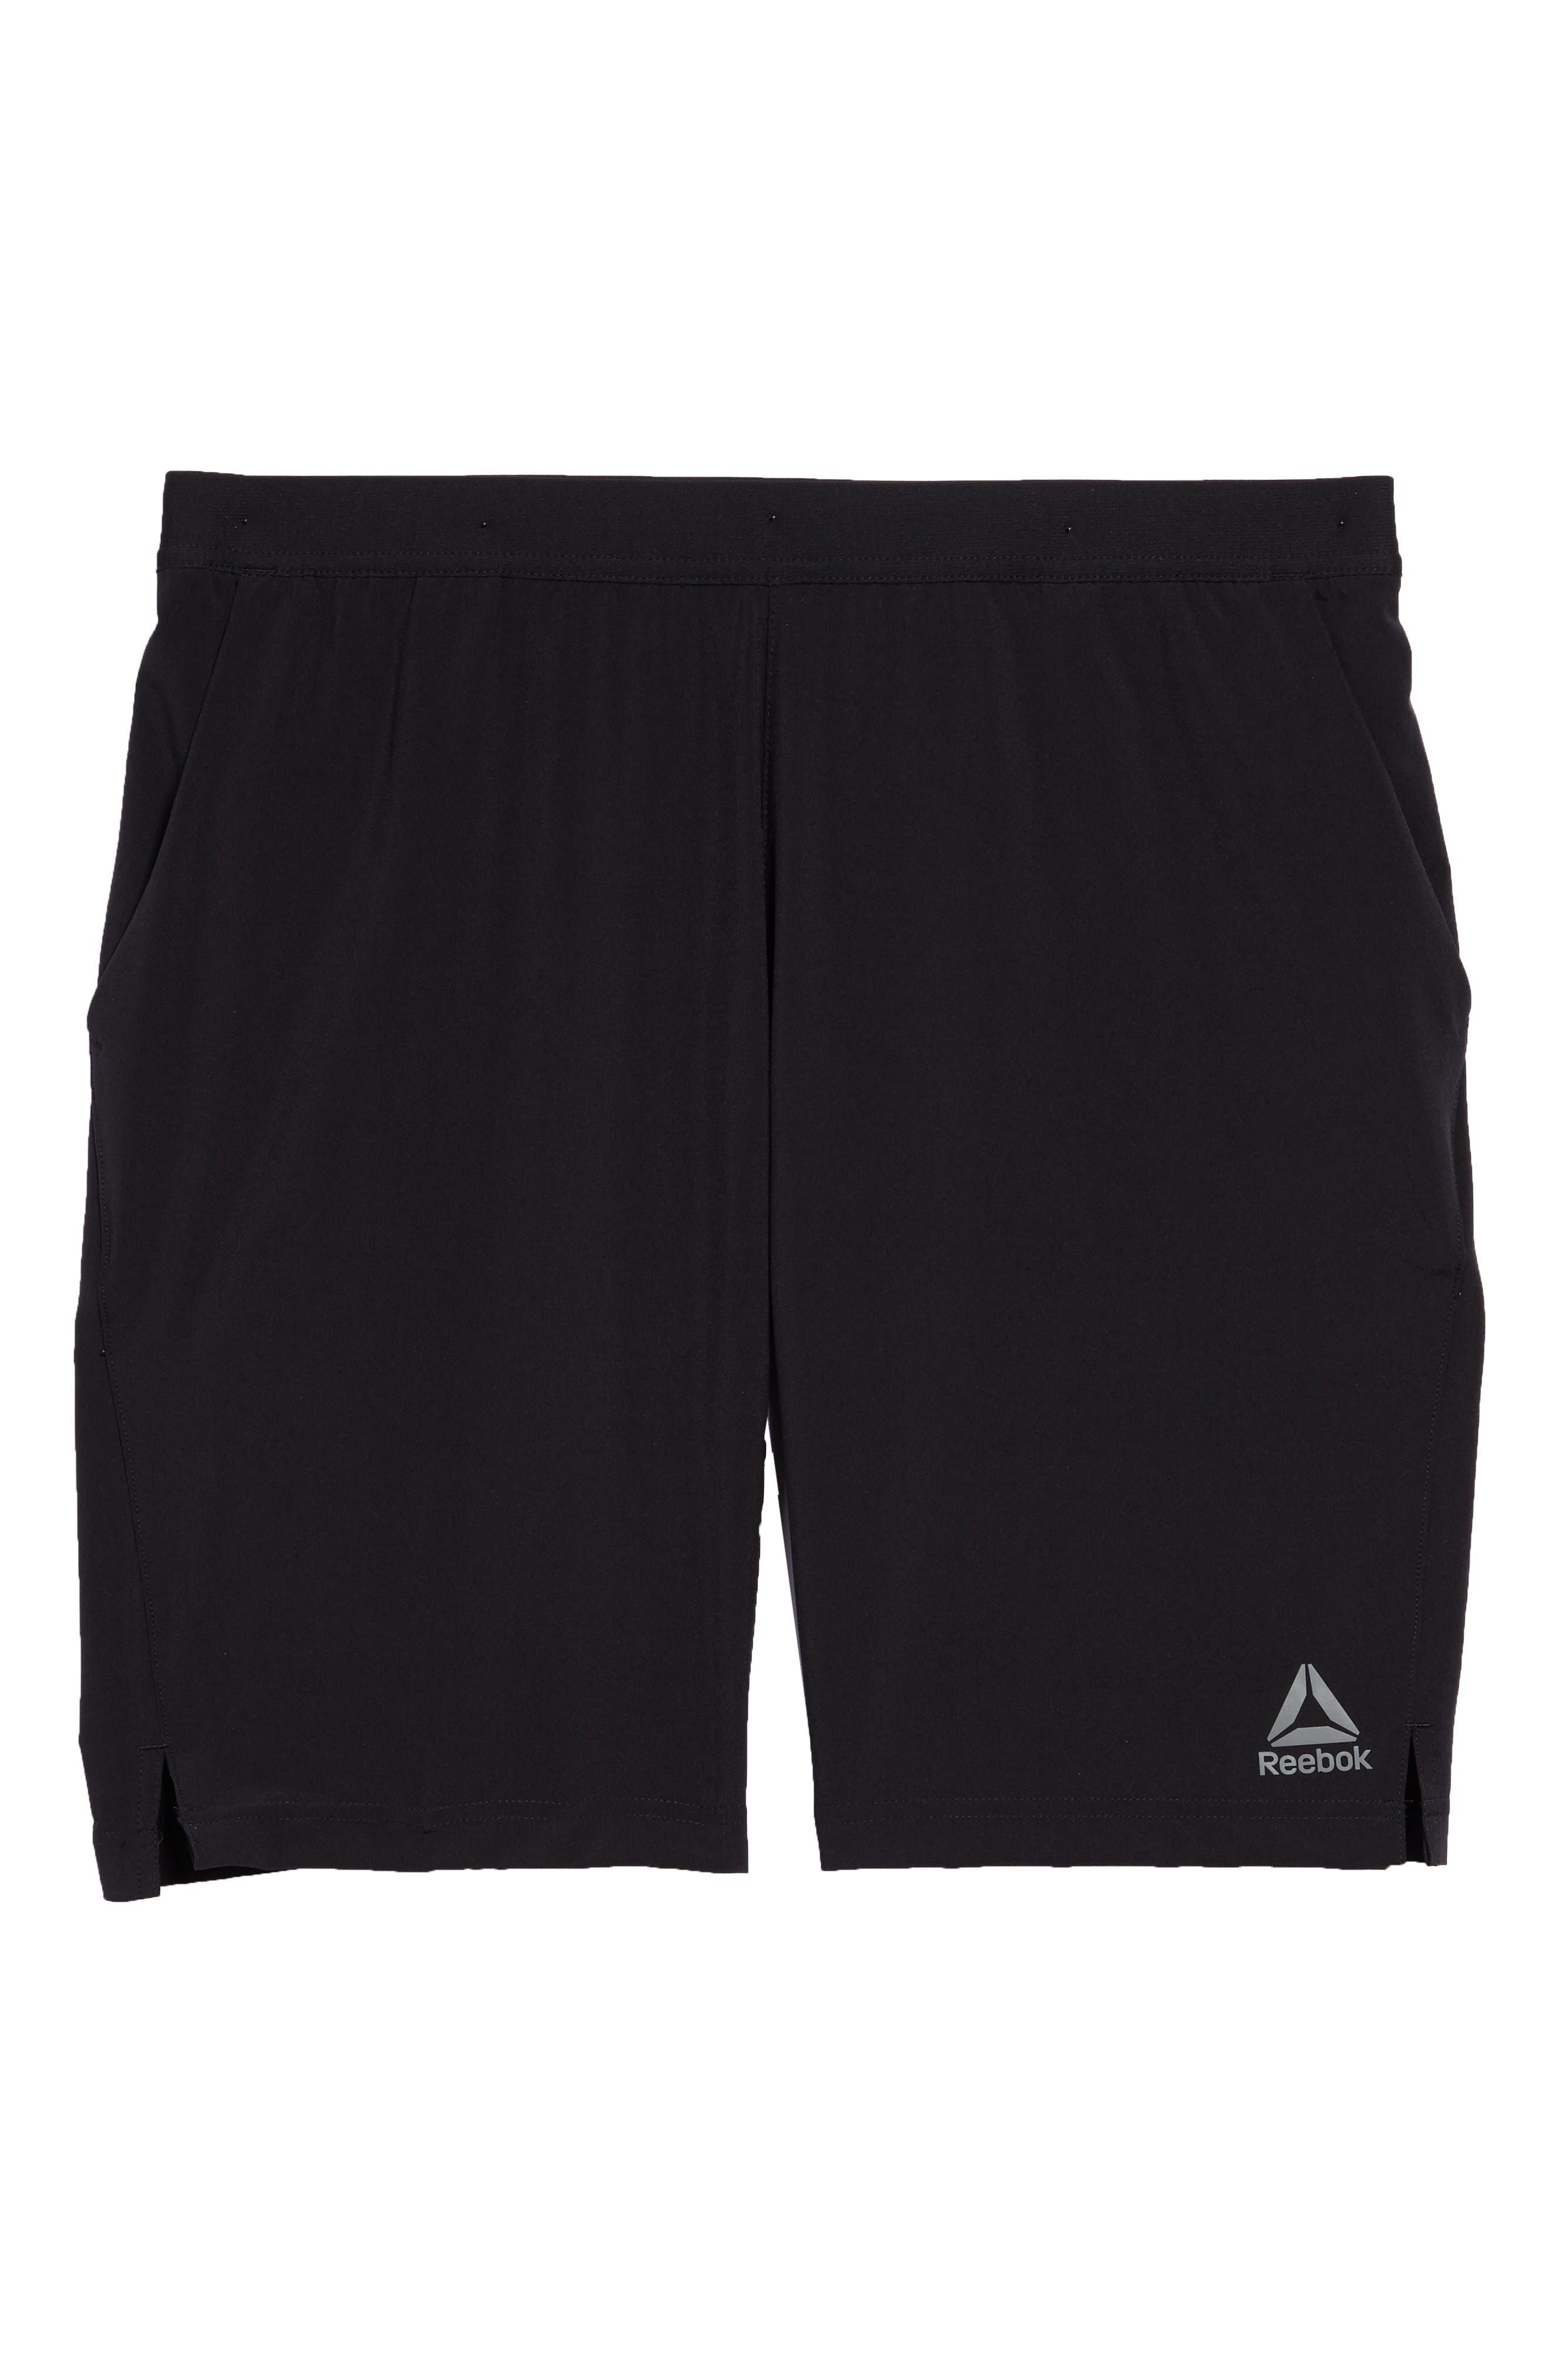 Speedwick Speed Training Shorts,                             Alternate thumbnail 6, color,                             BLACK